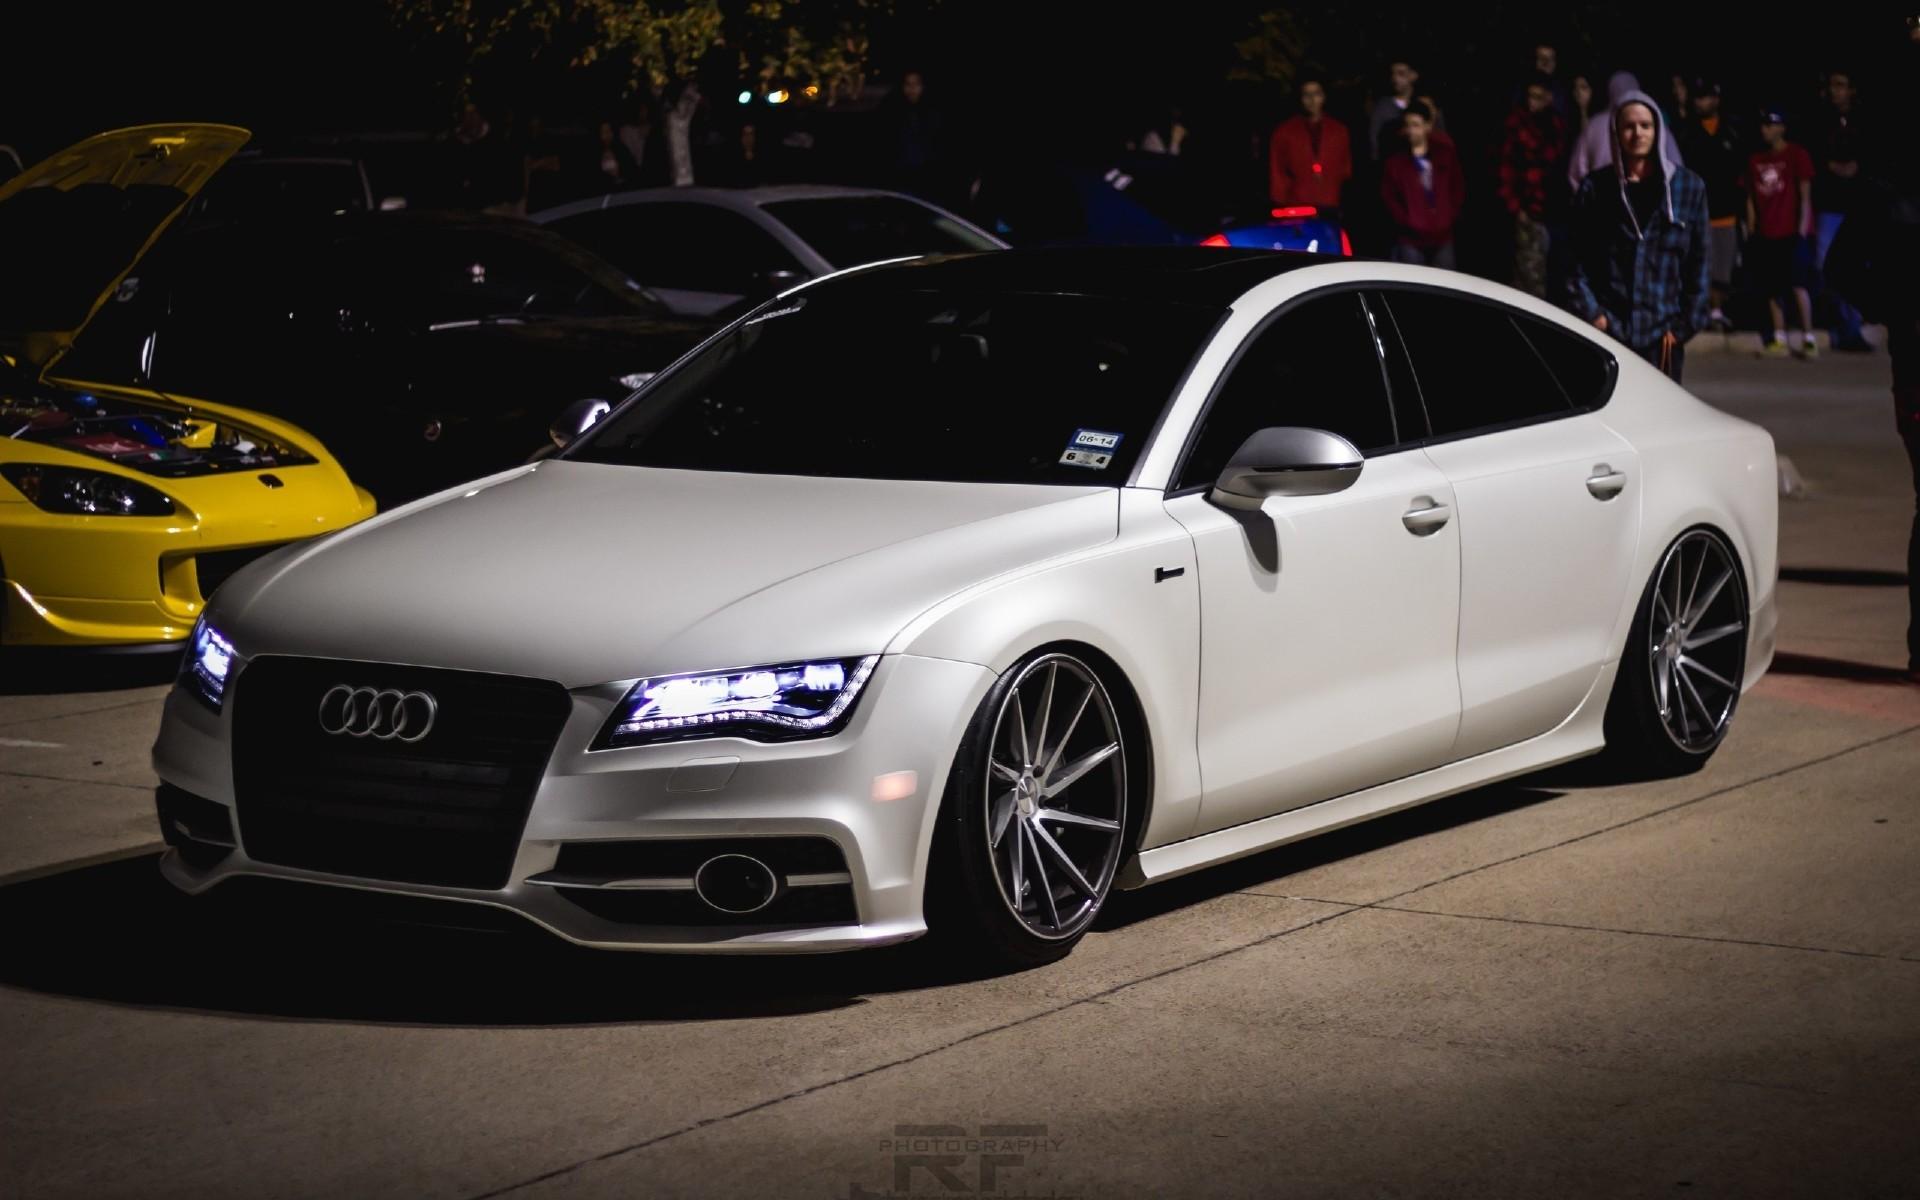 Audi A7 Tuning Tuning